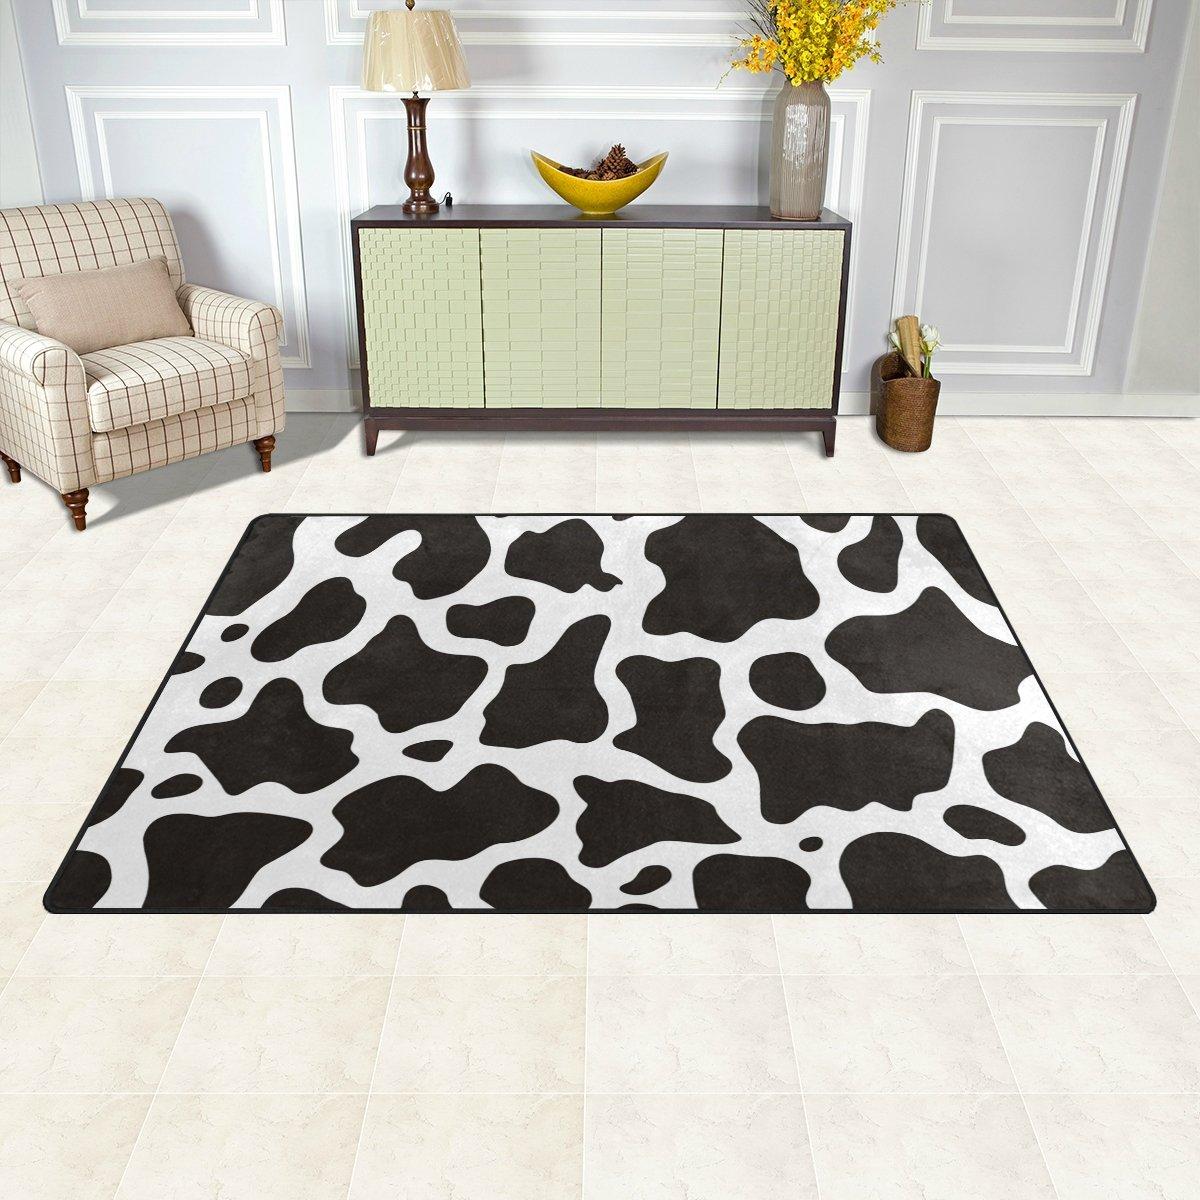 WellLee Area Rug,Black White Cow Skin Print Floor Rug Non-Slip Doormat for Living Dining Dorm Room Bedroom Decor 31x20 Inch